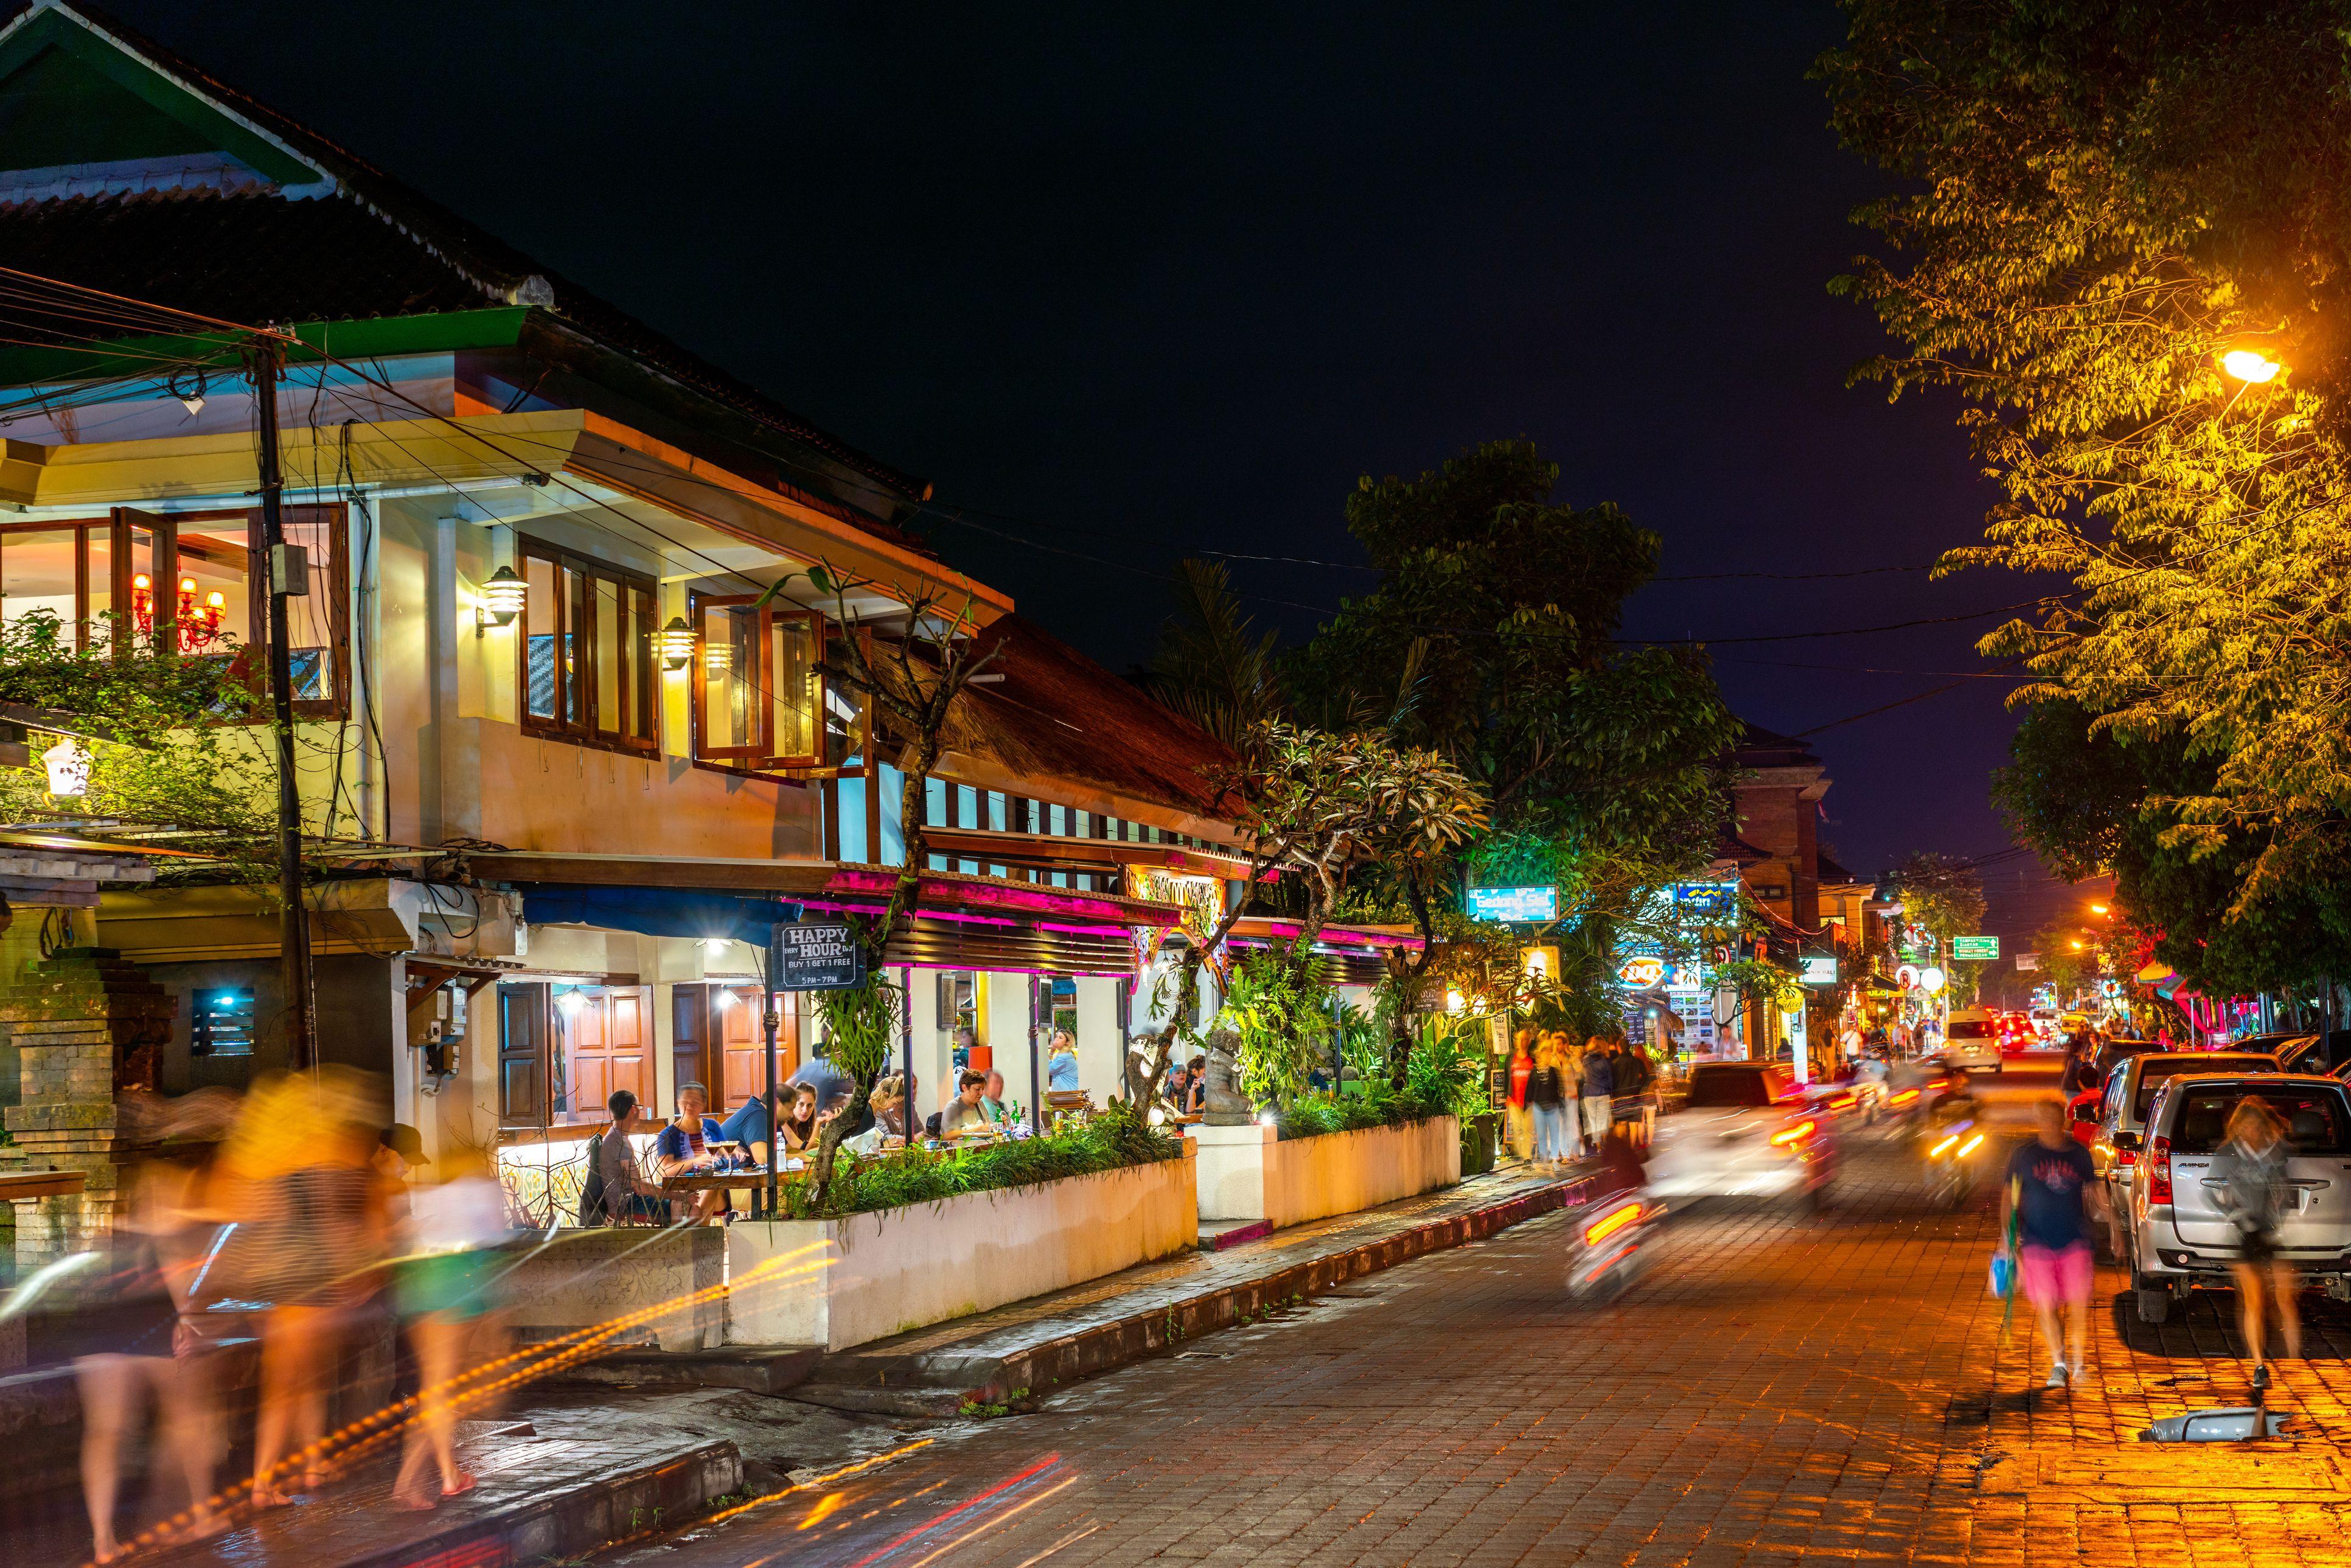 Ubud Royal Palace Street at Night, Bali, Indonesia